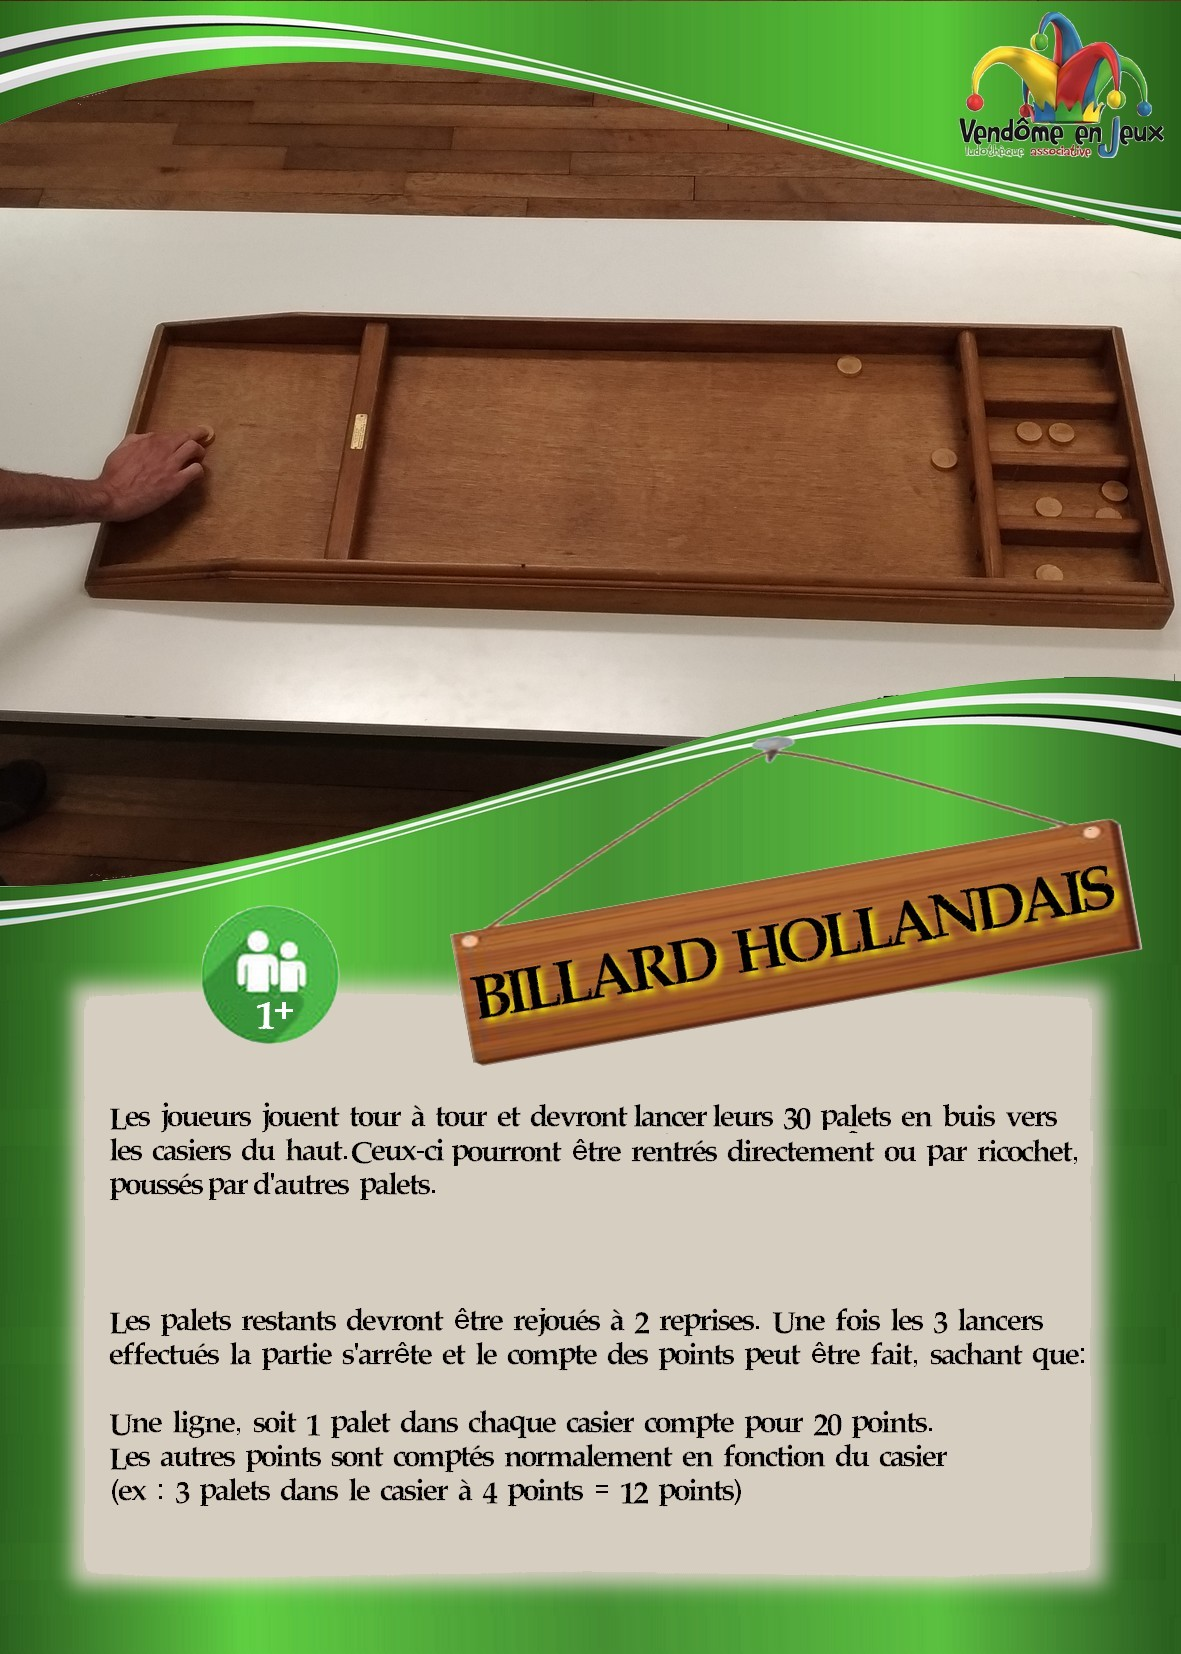 billardHollandais